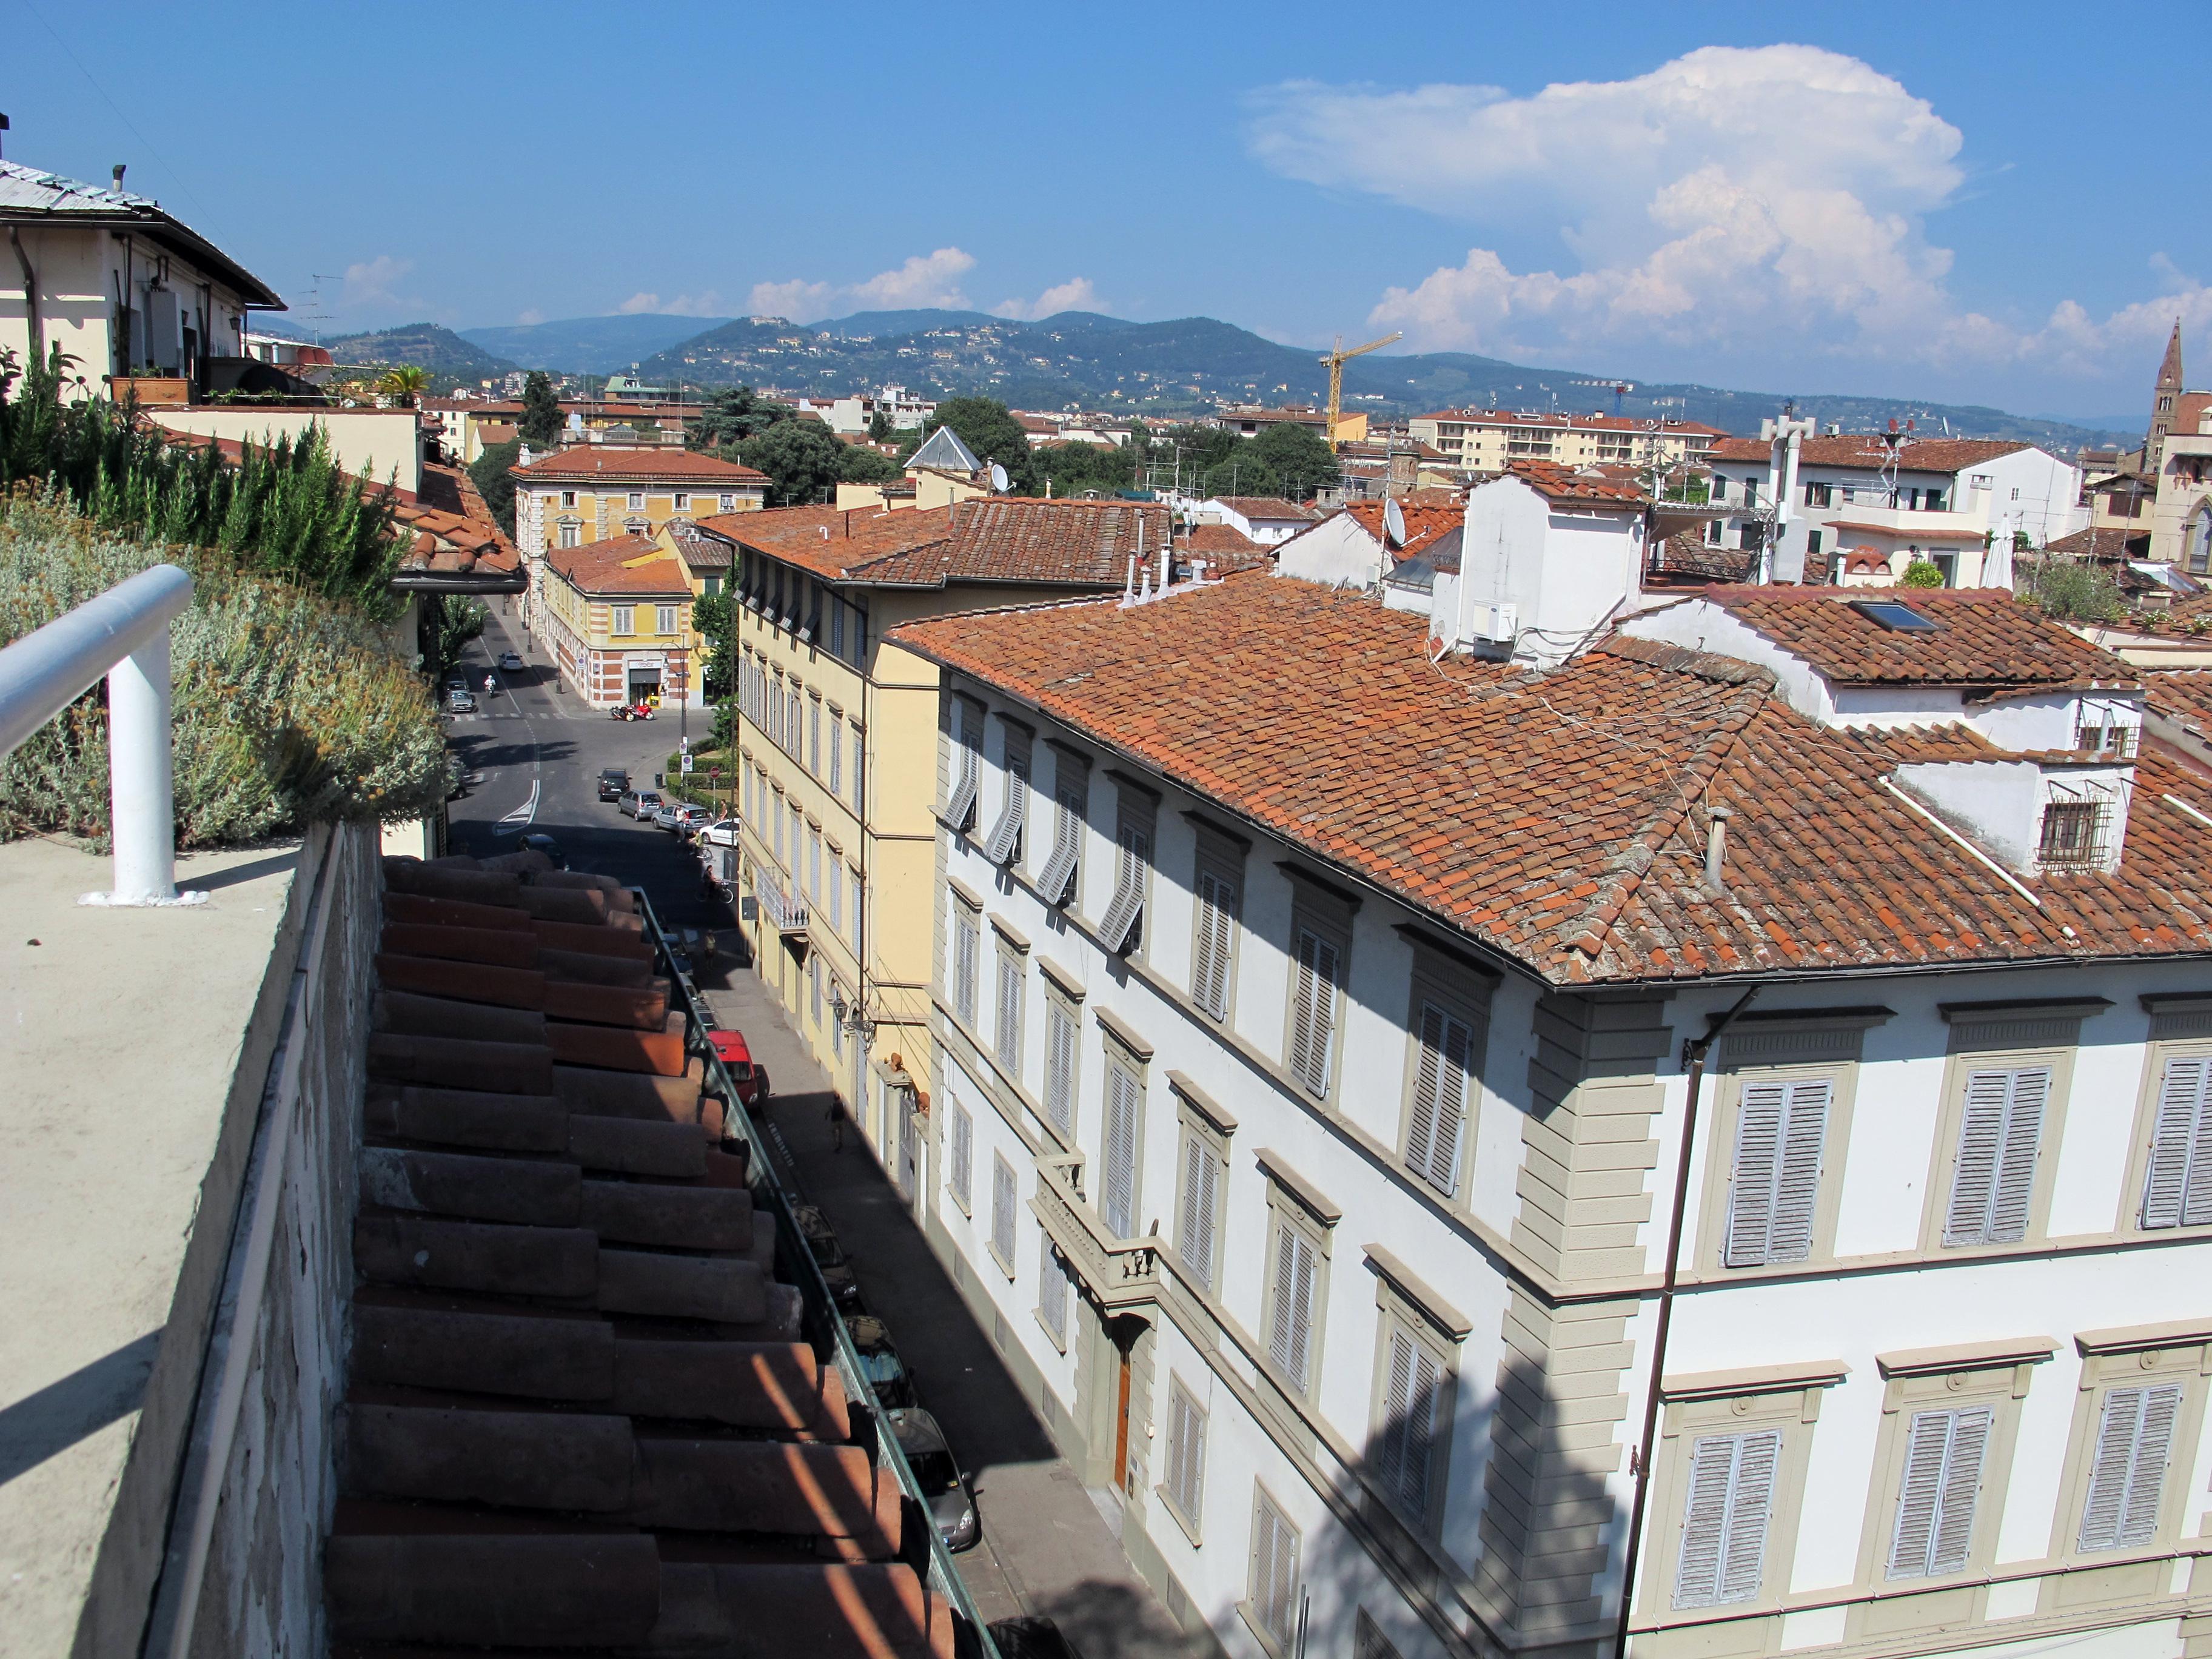 File:Hotel kraft, terrazza, veduta 10 via palestro.JPG - Wikimedia ...